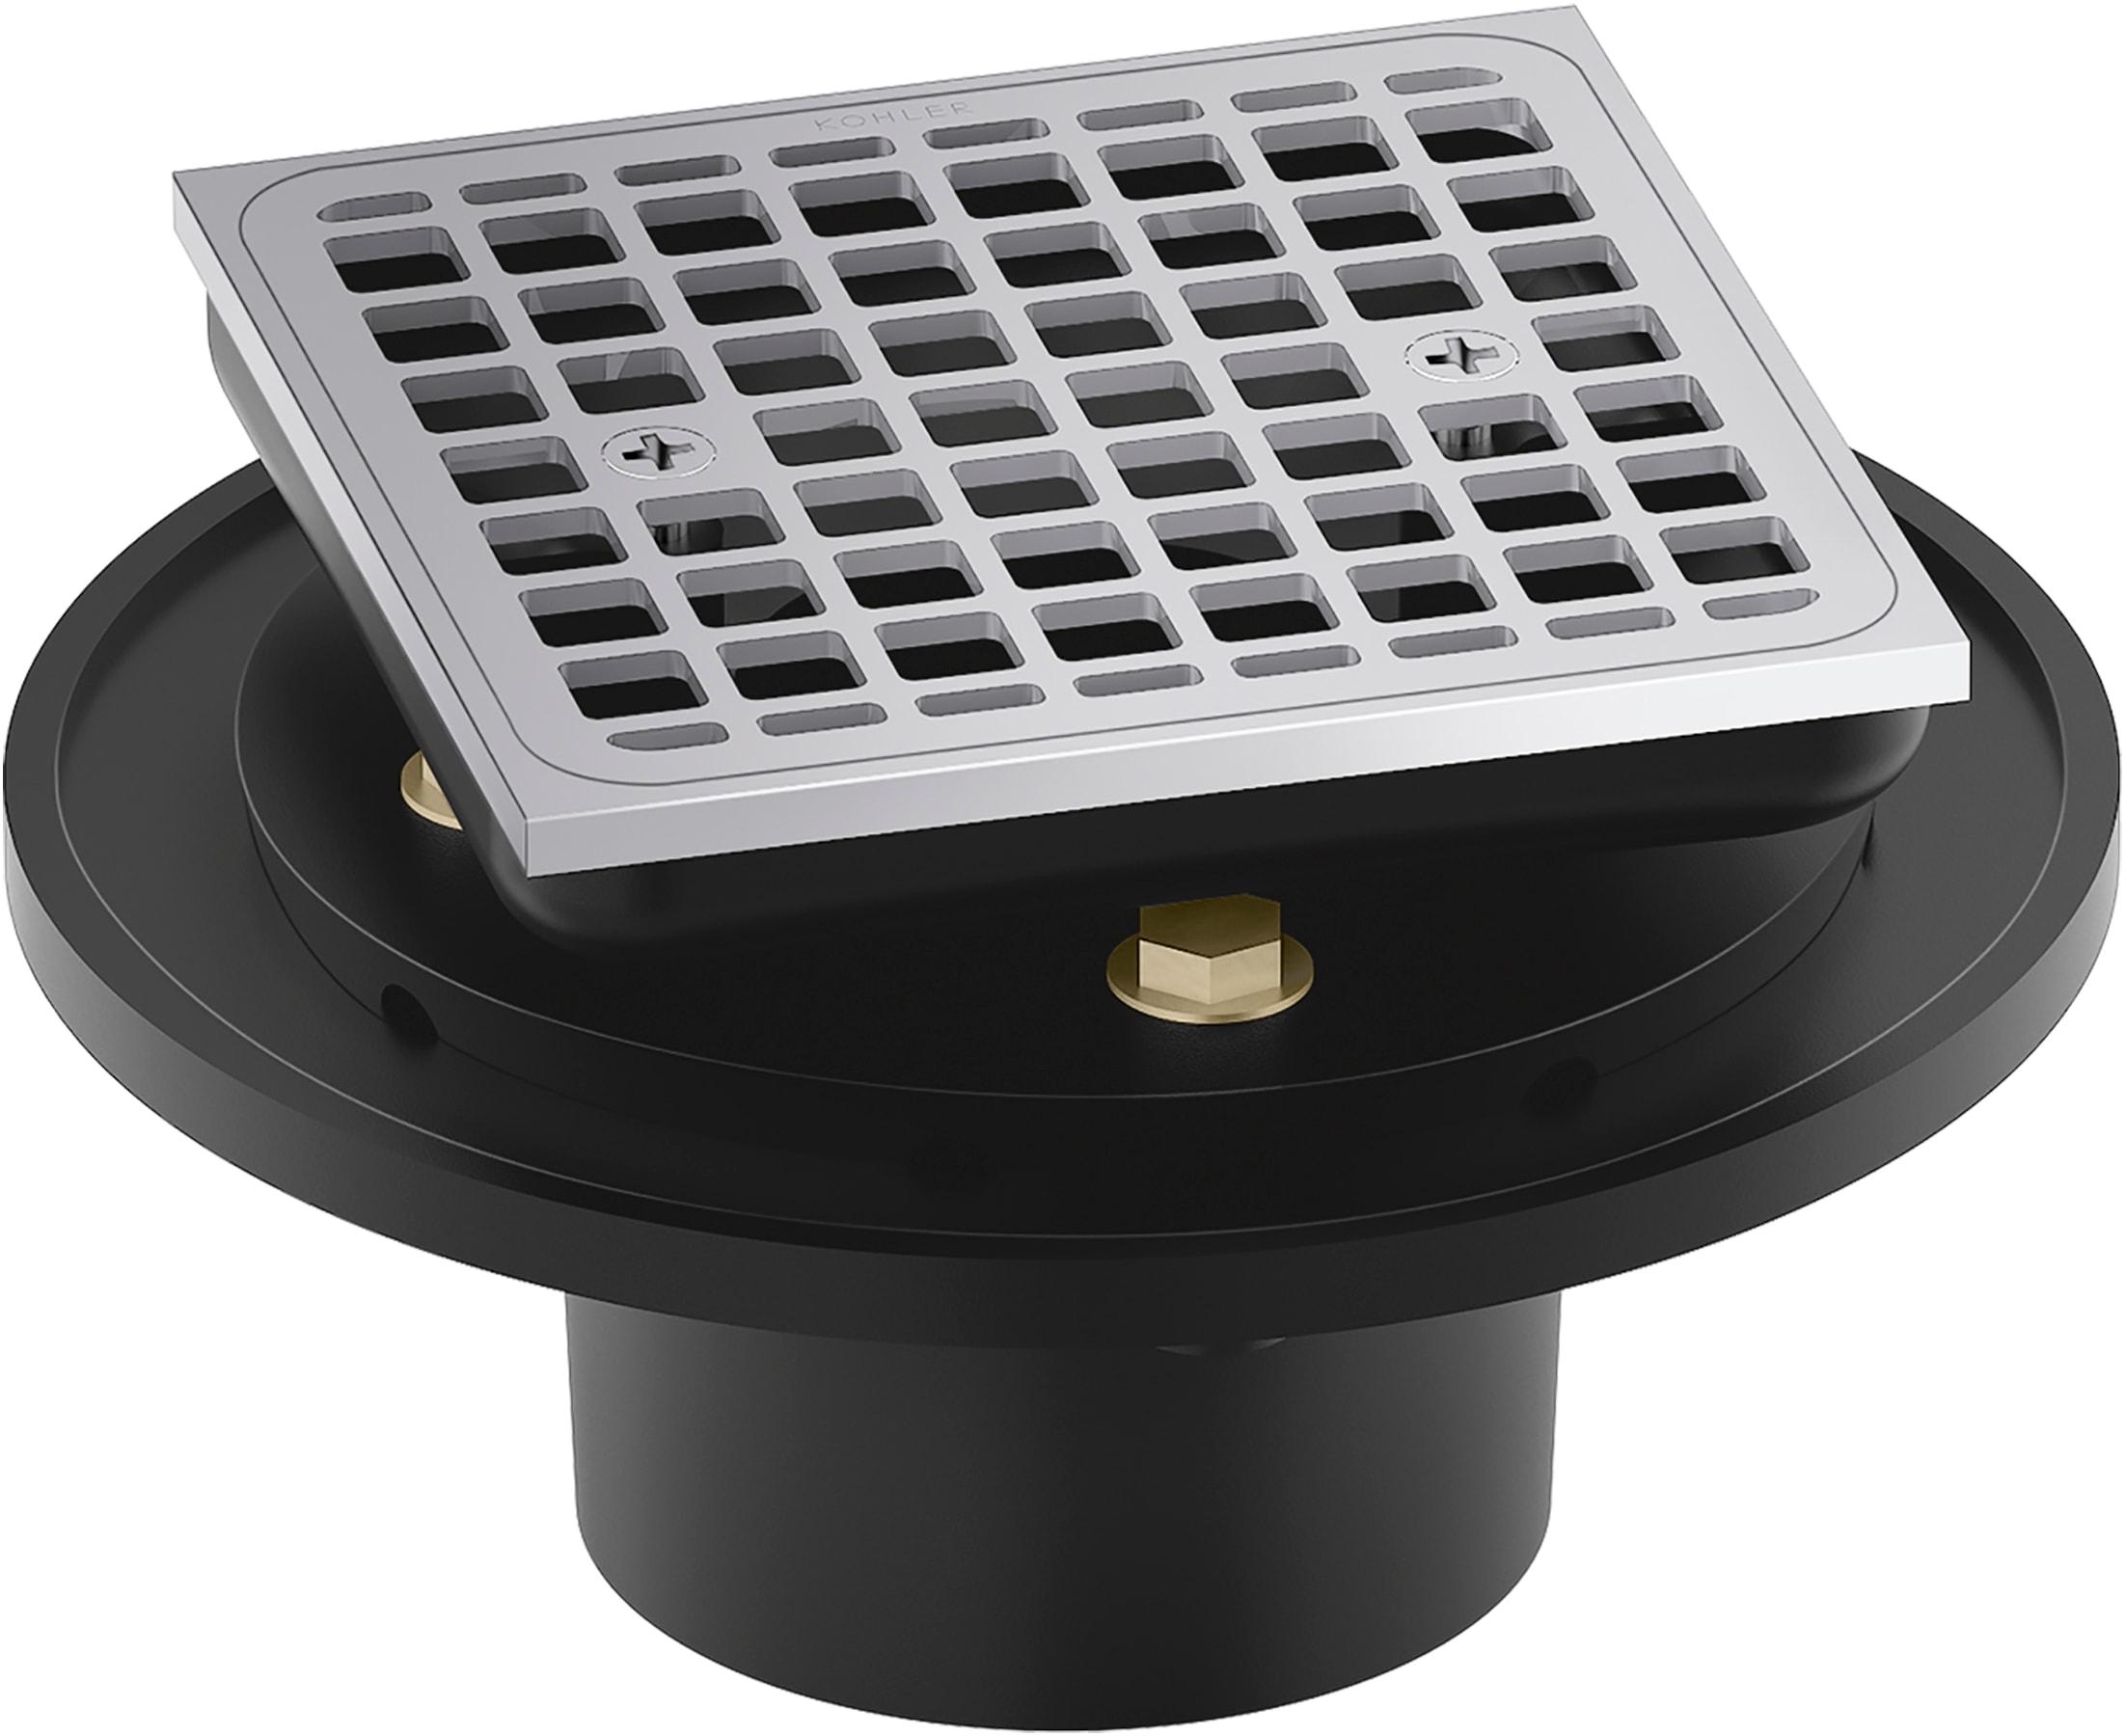 Kohler K 22673 Bn Brushed Nickel Clearflo Square Brass Tile In Shower Drain Faucet Com